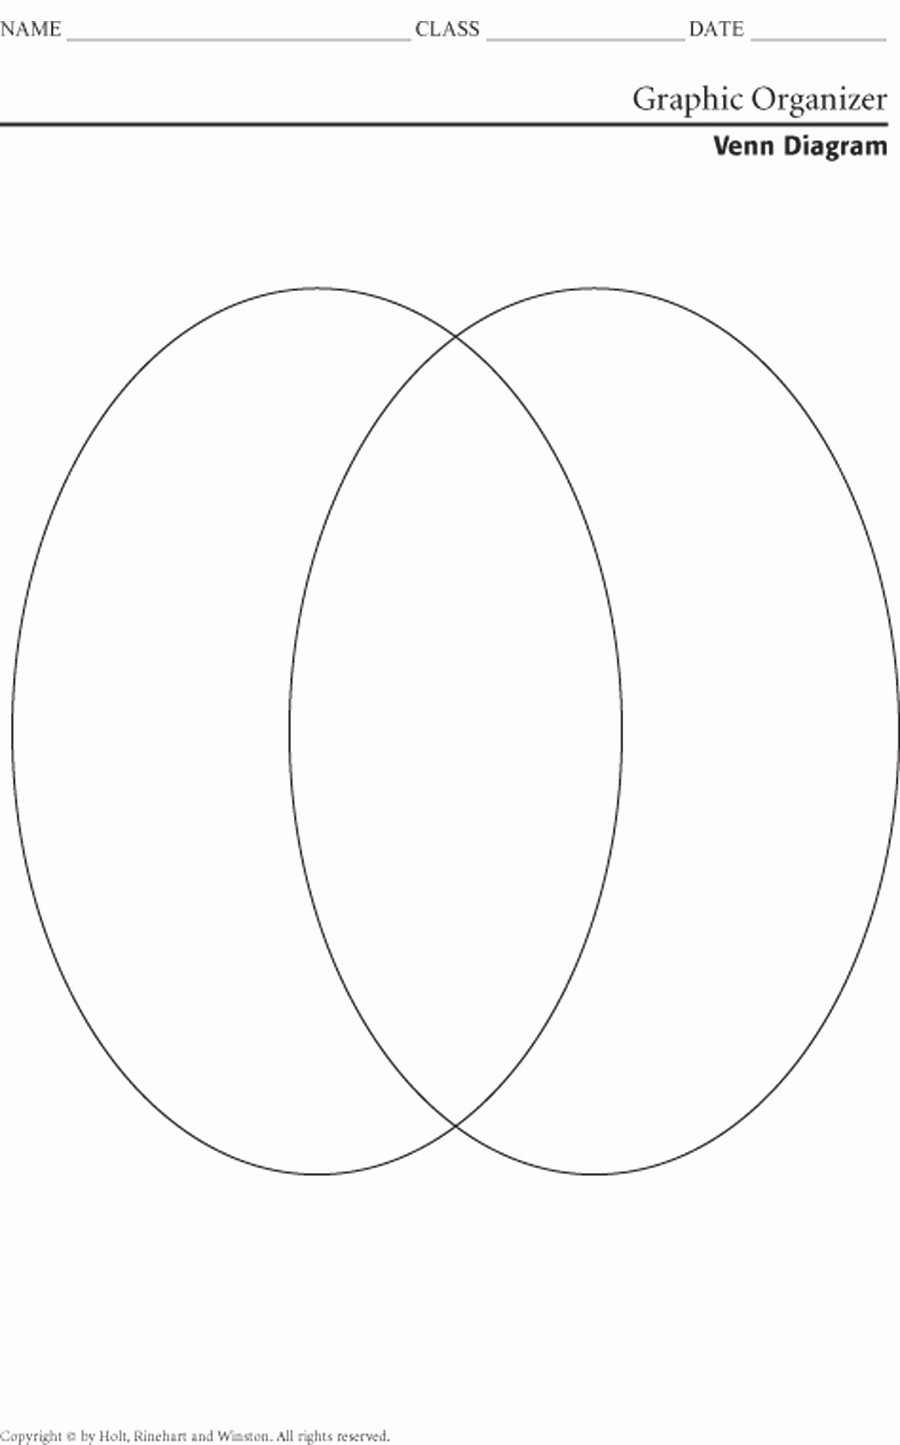 Venn Diagram Template Word New Printable Venn Diagram 2 Circles